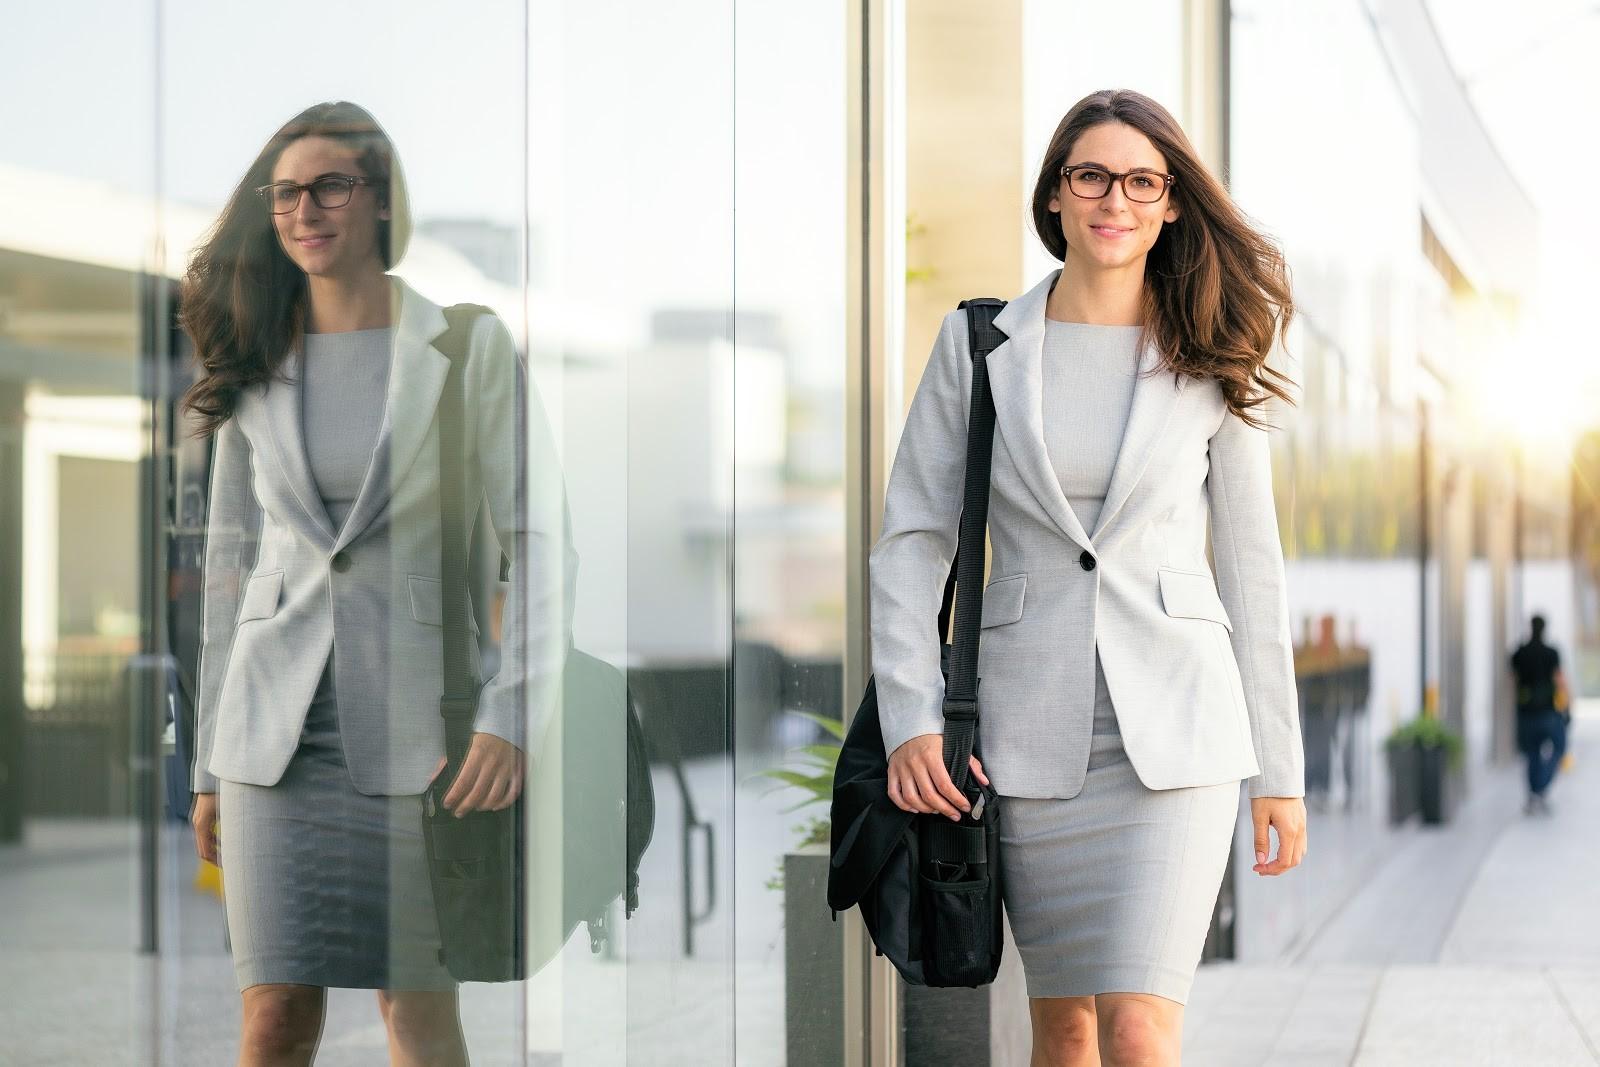 Is an MBA worth it: Woman walking along the street